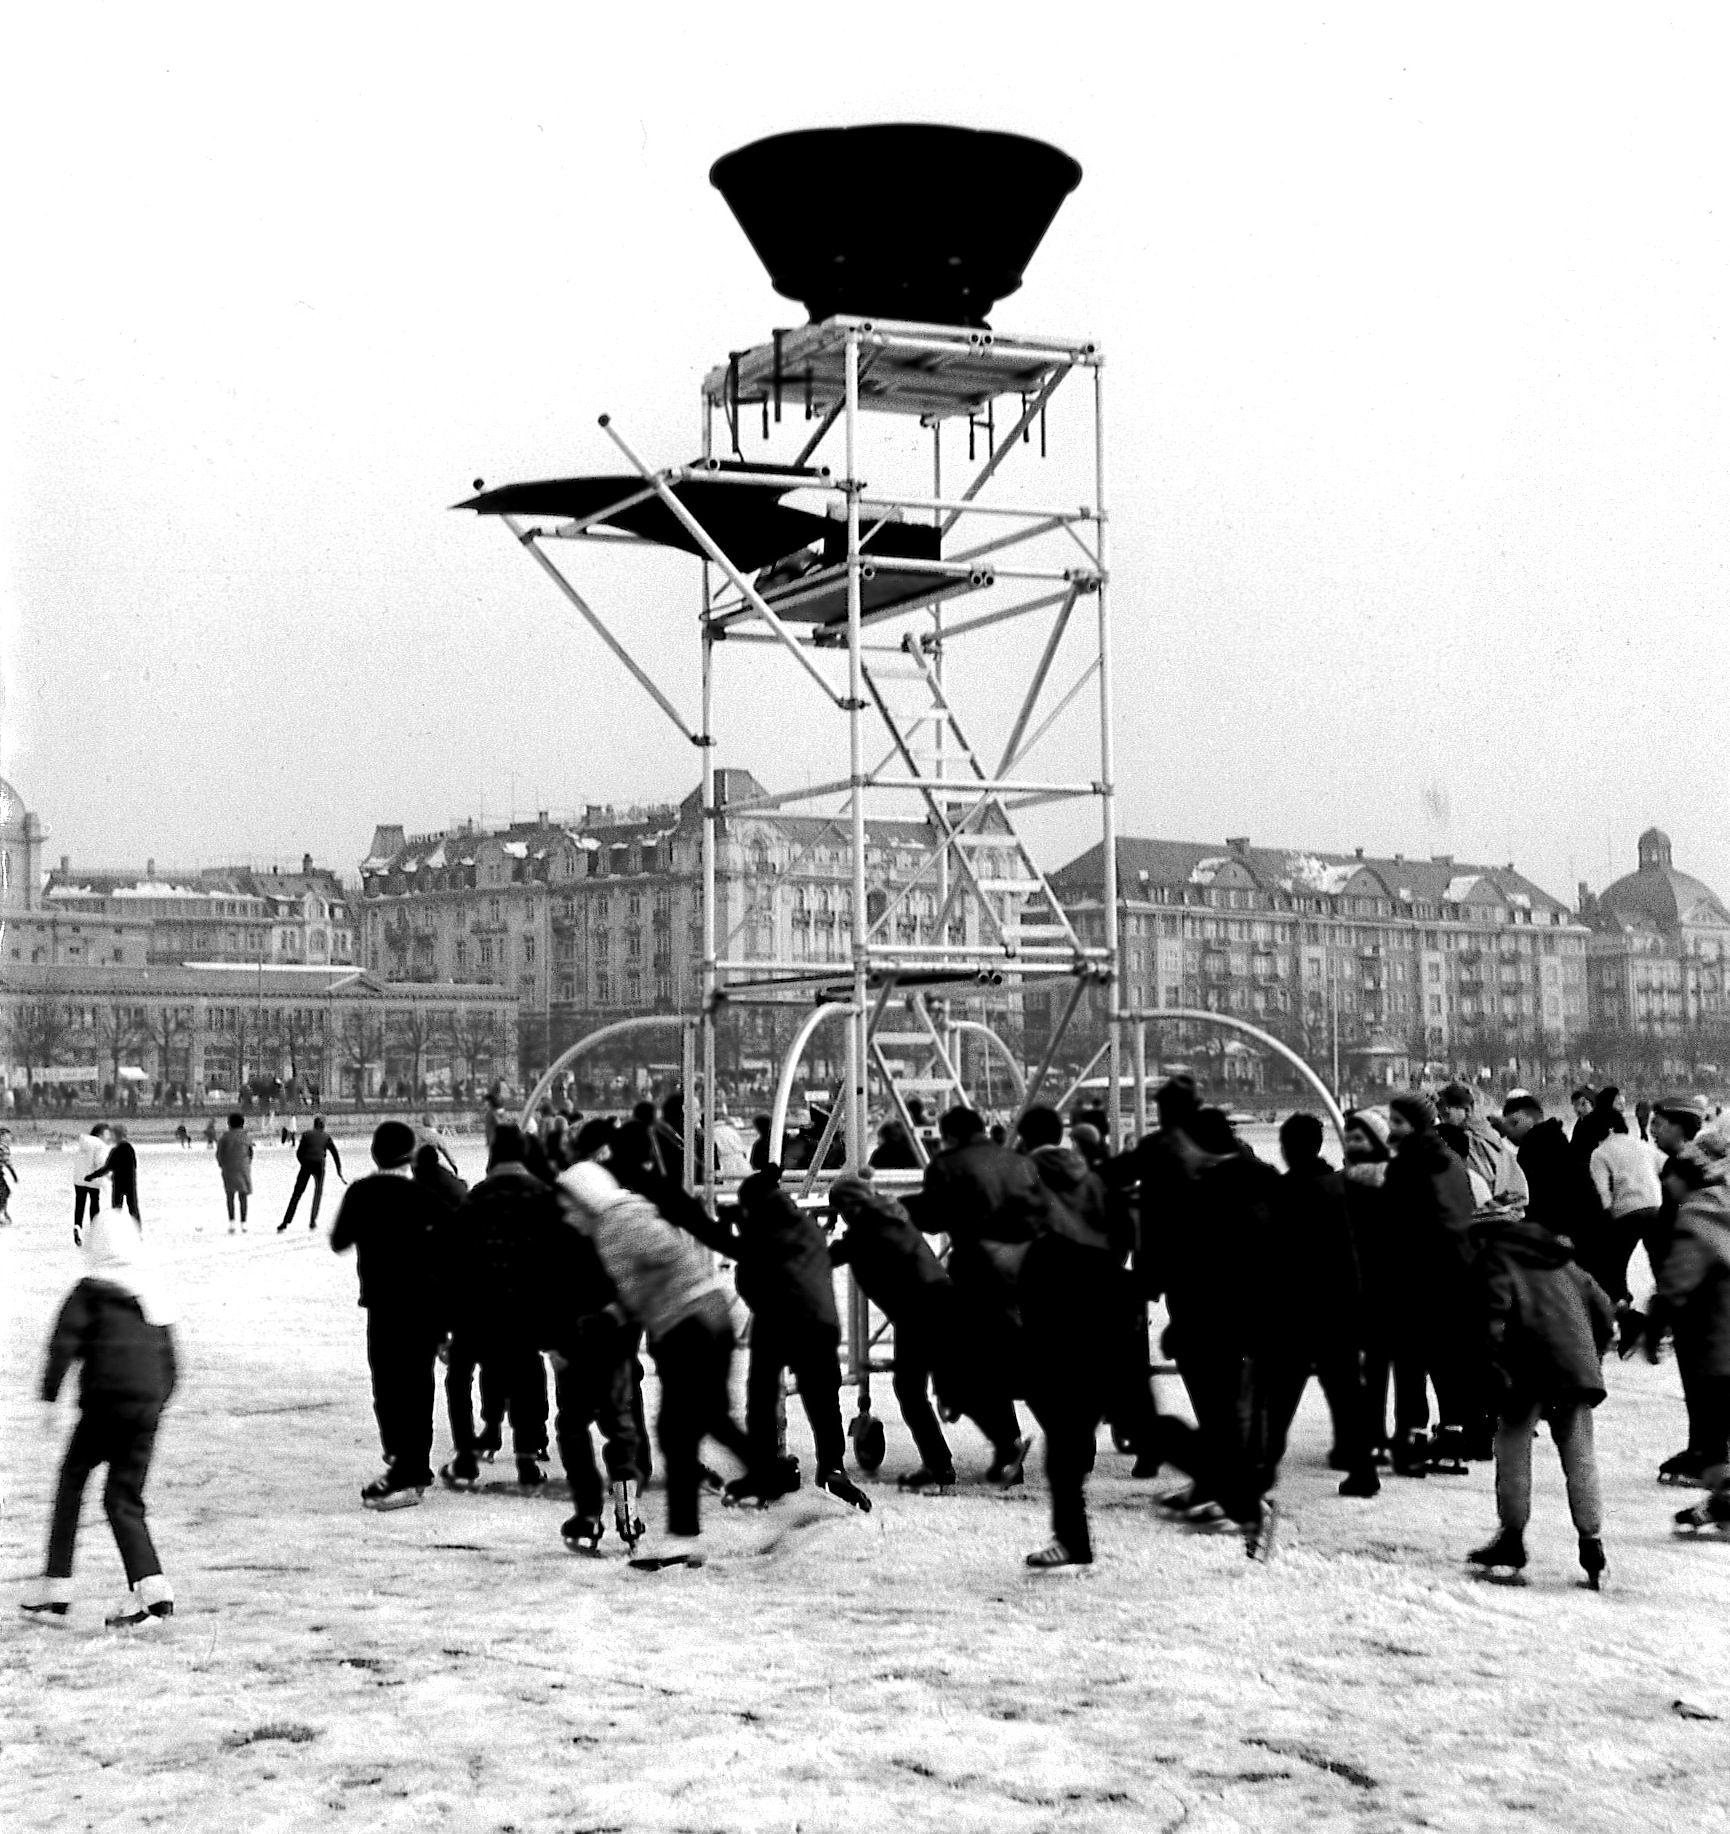 Zürcher Seegfrörni 1963